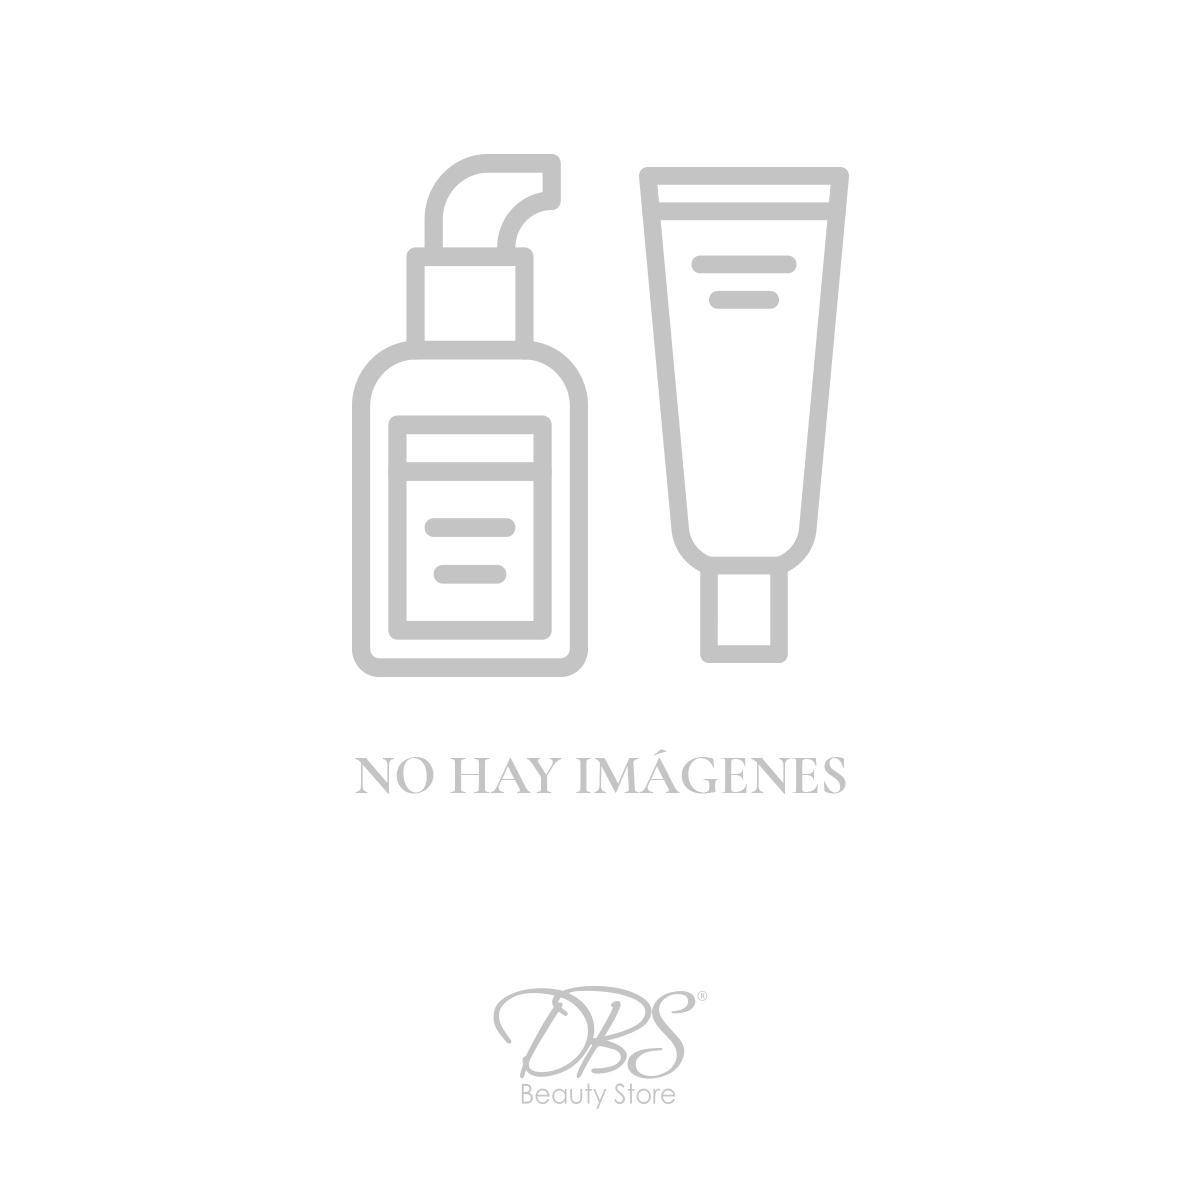 Shampoo Blondifier Gloss 500 Ml